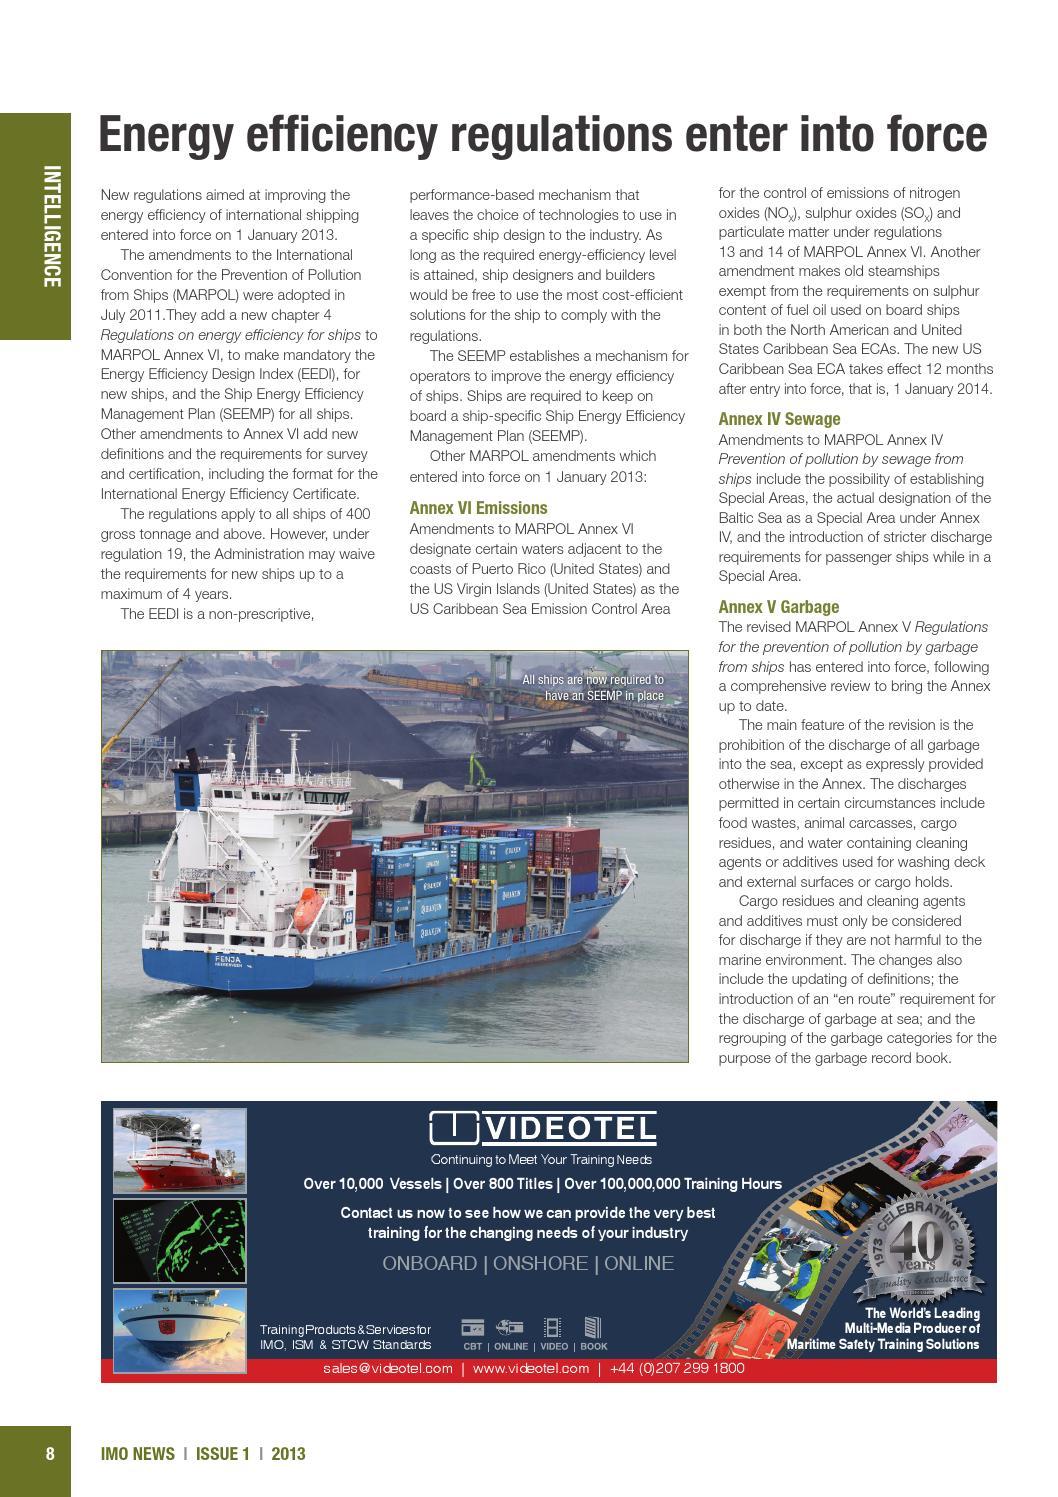 IMO News - Issue 1 - 2013 by IMO News Magazine - issuu